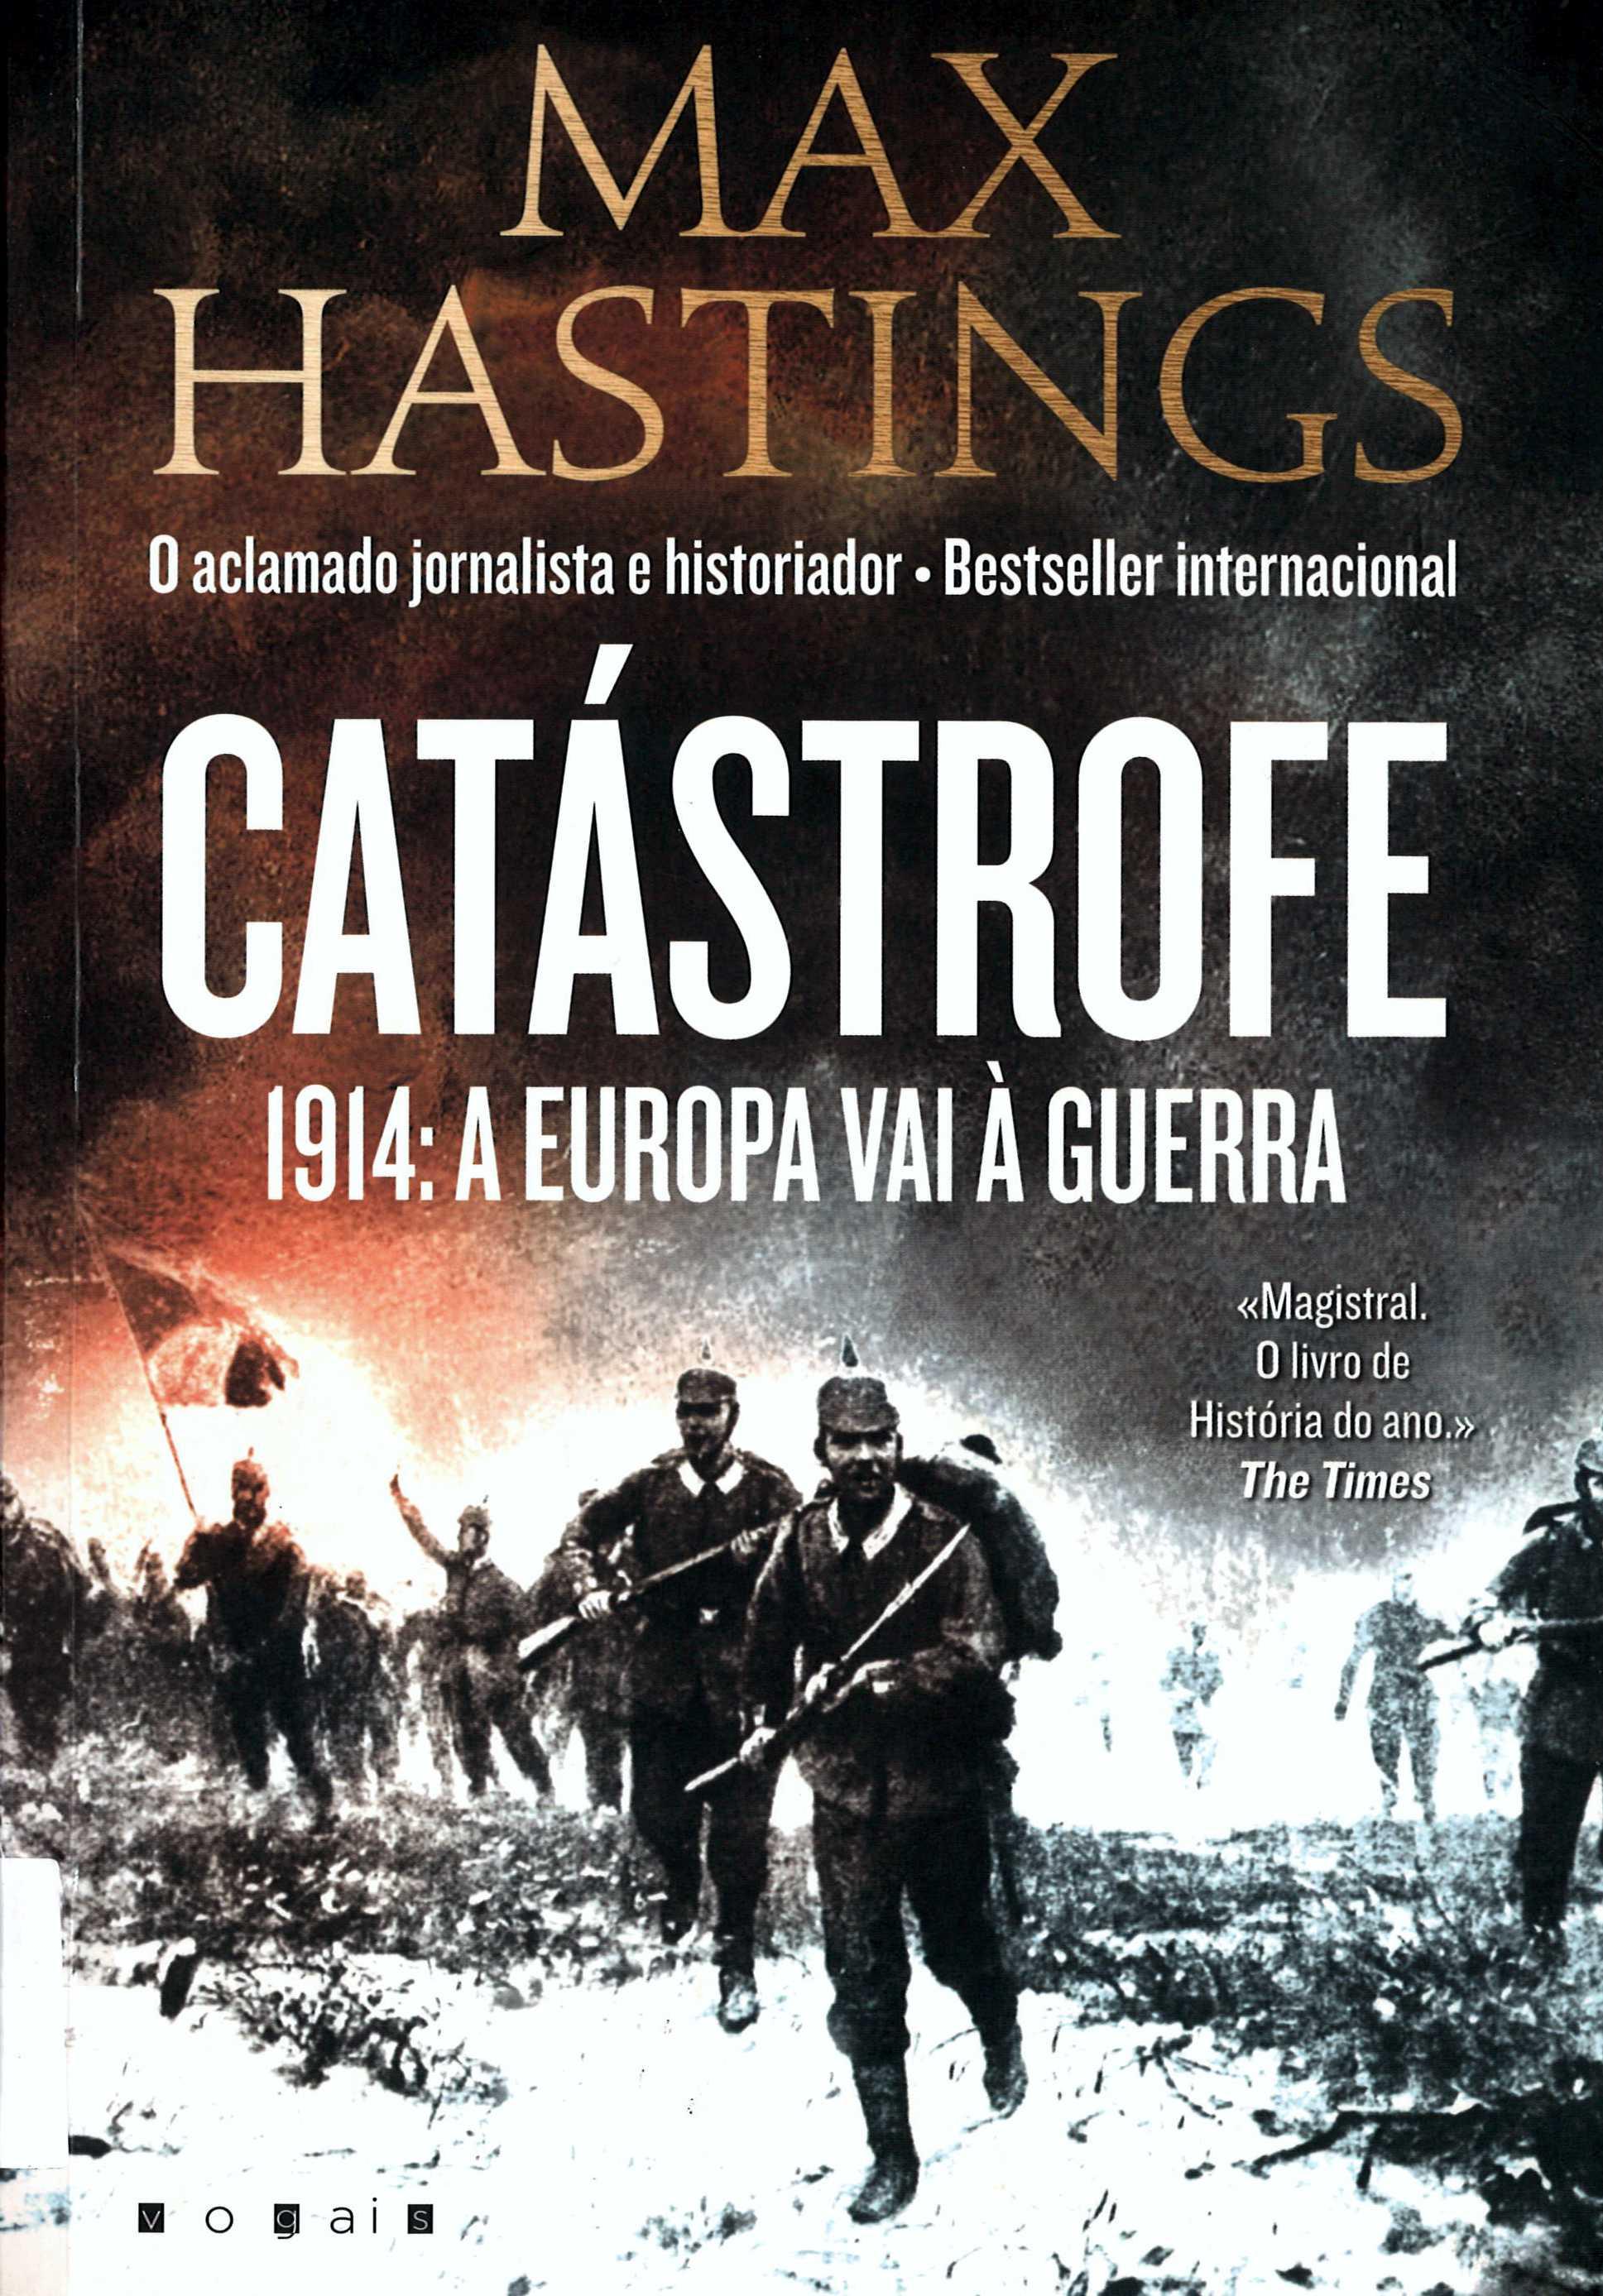 CATÁSTROFE 1914: A EUROPA VAI À GUERRA